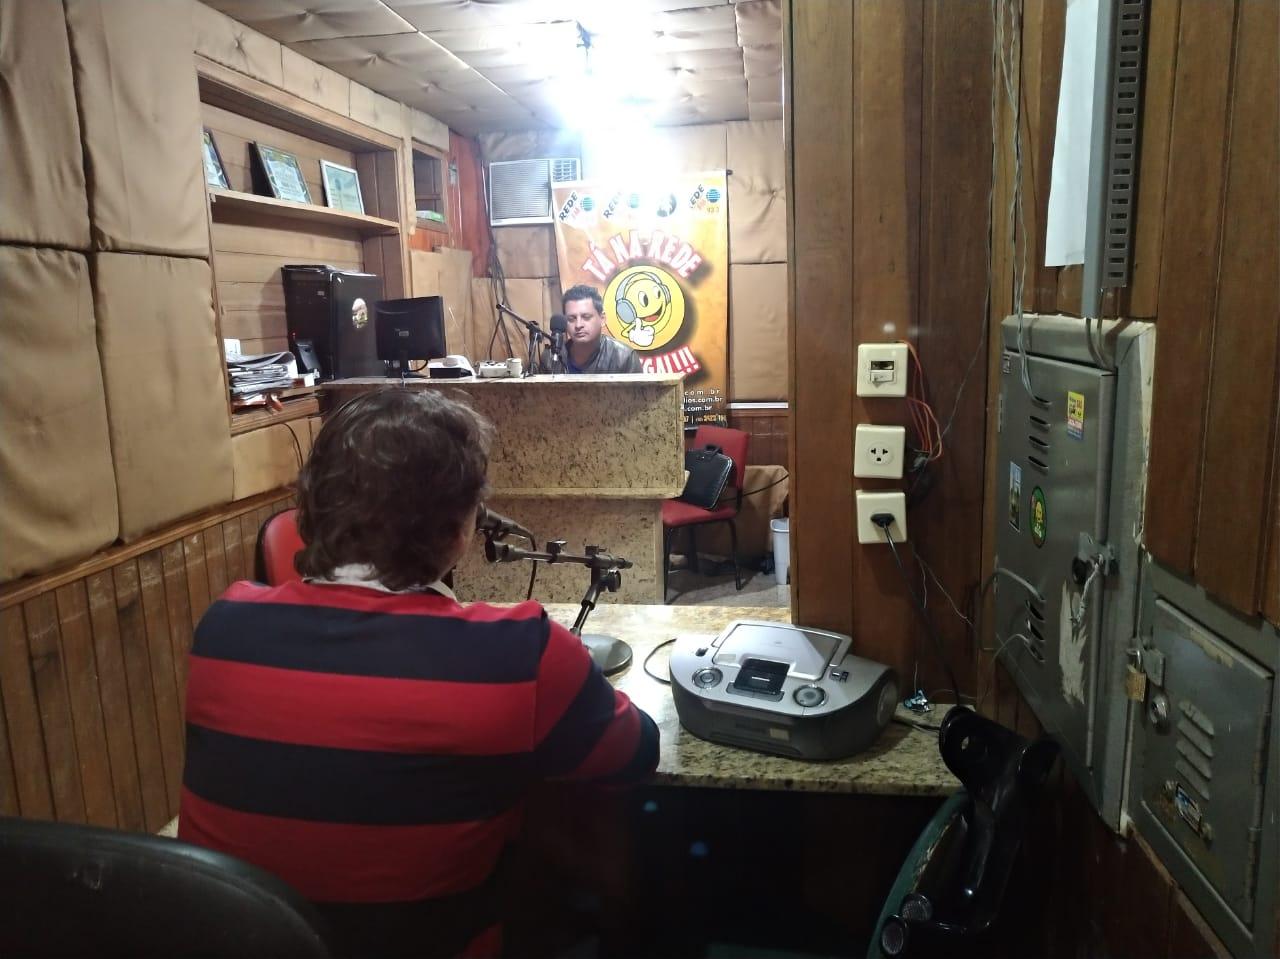 Entrevista para a Rádio 101,9 FM de Paranavaí.